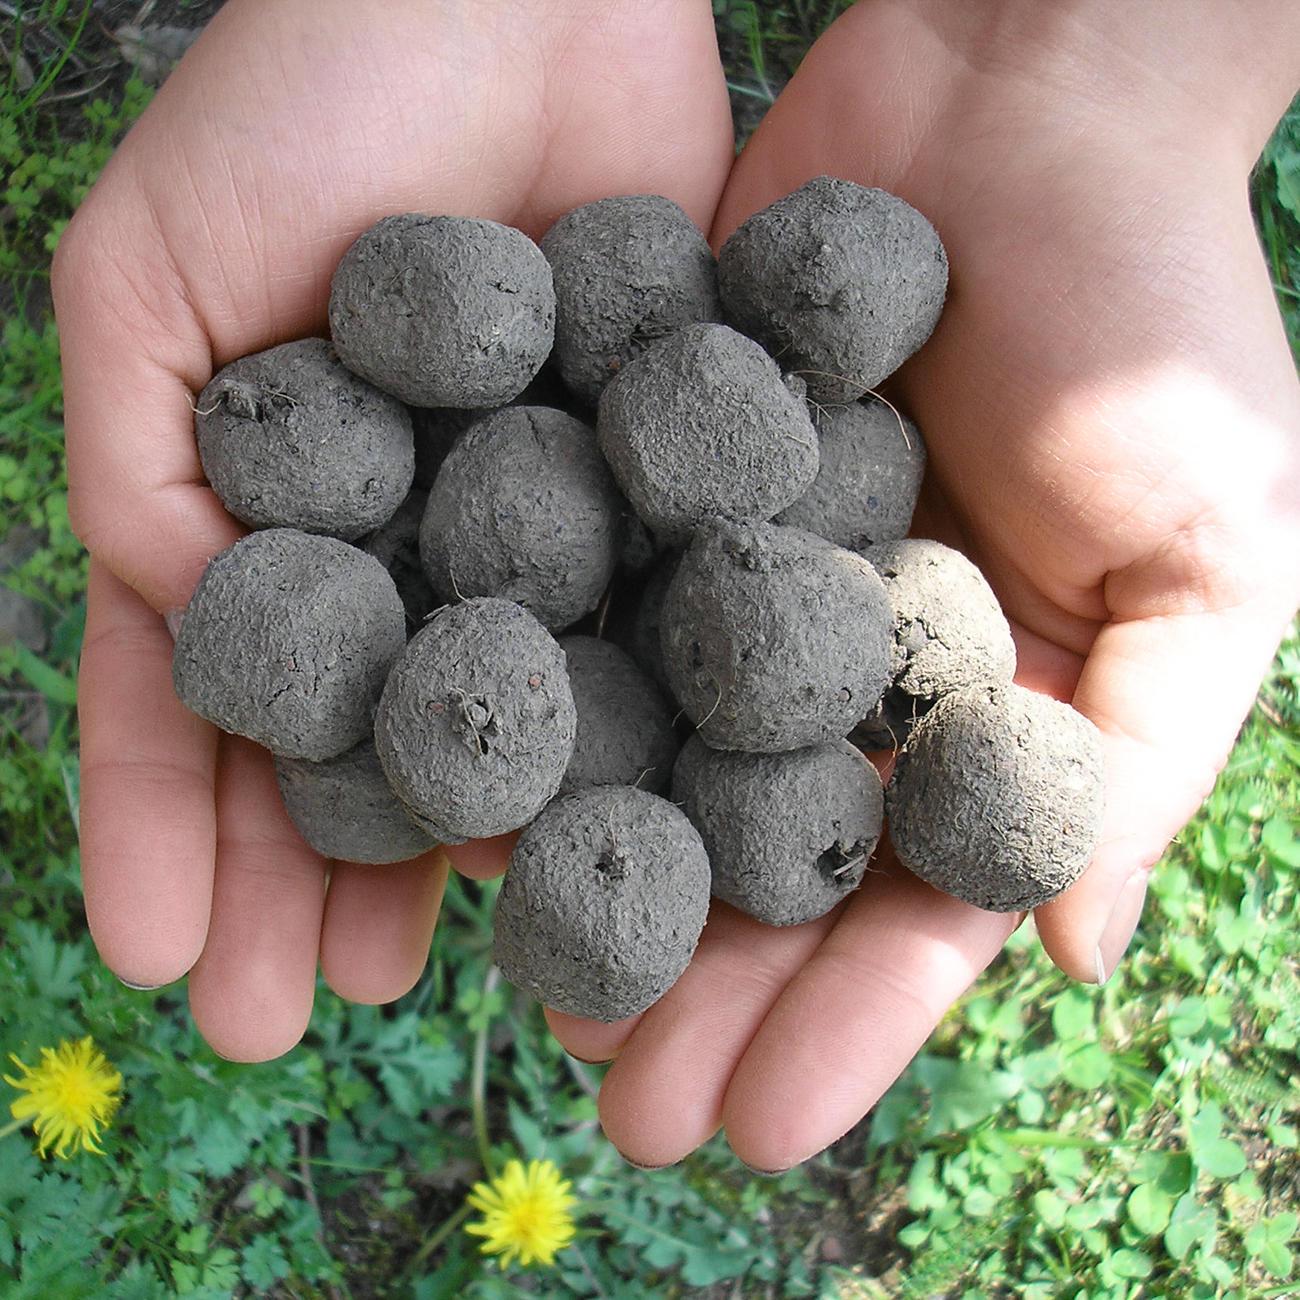 Buy Seed Bomb Kit | 3-year product guarantee